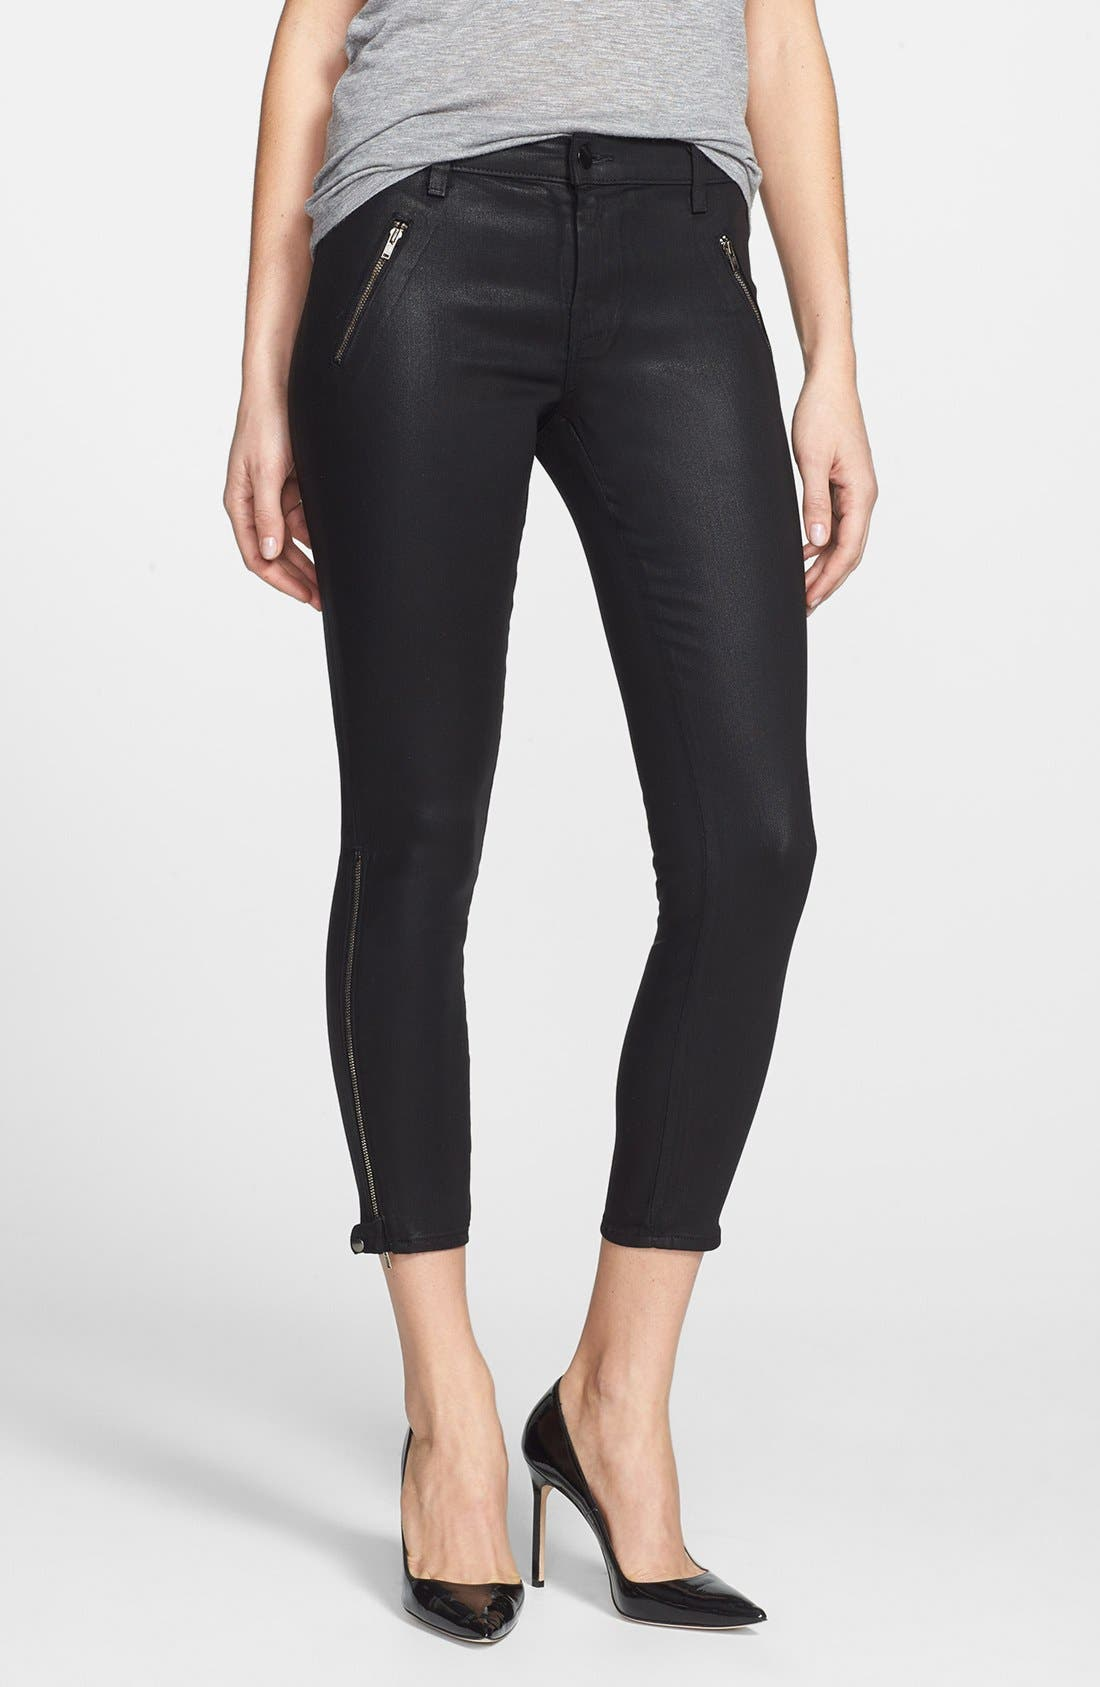 Main Image - J Brand '1446 Carey' Moto Skinny Crop Pants (Lacquered Black)